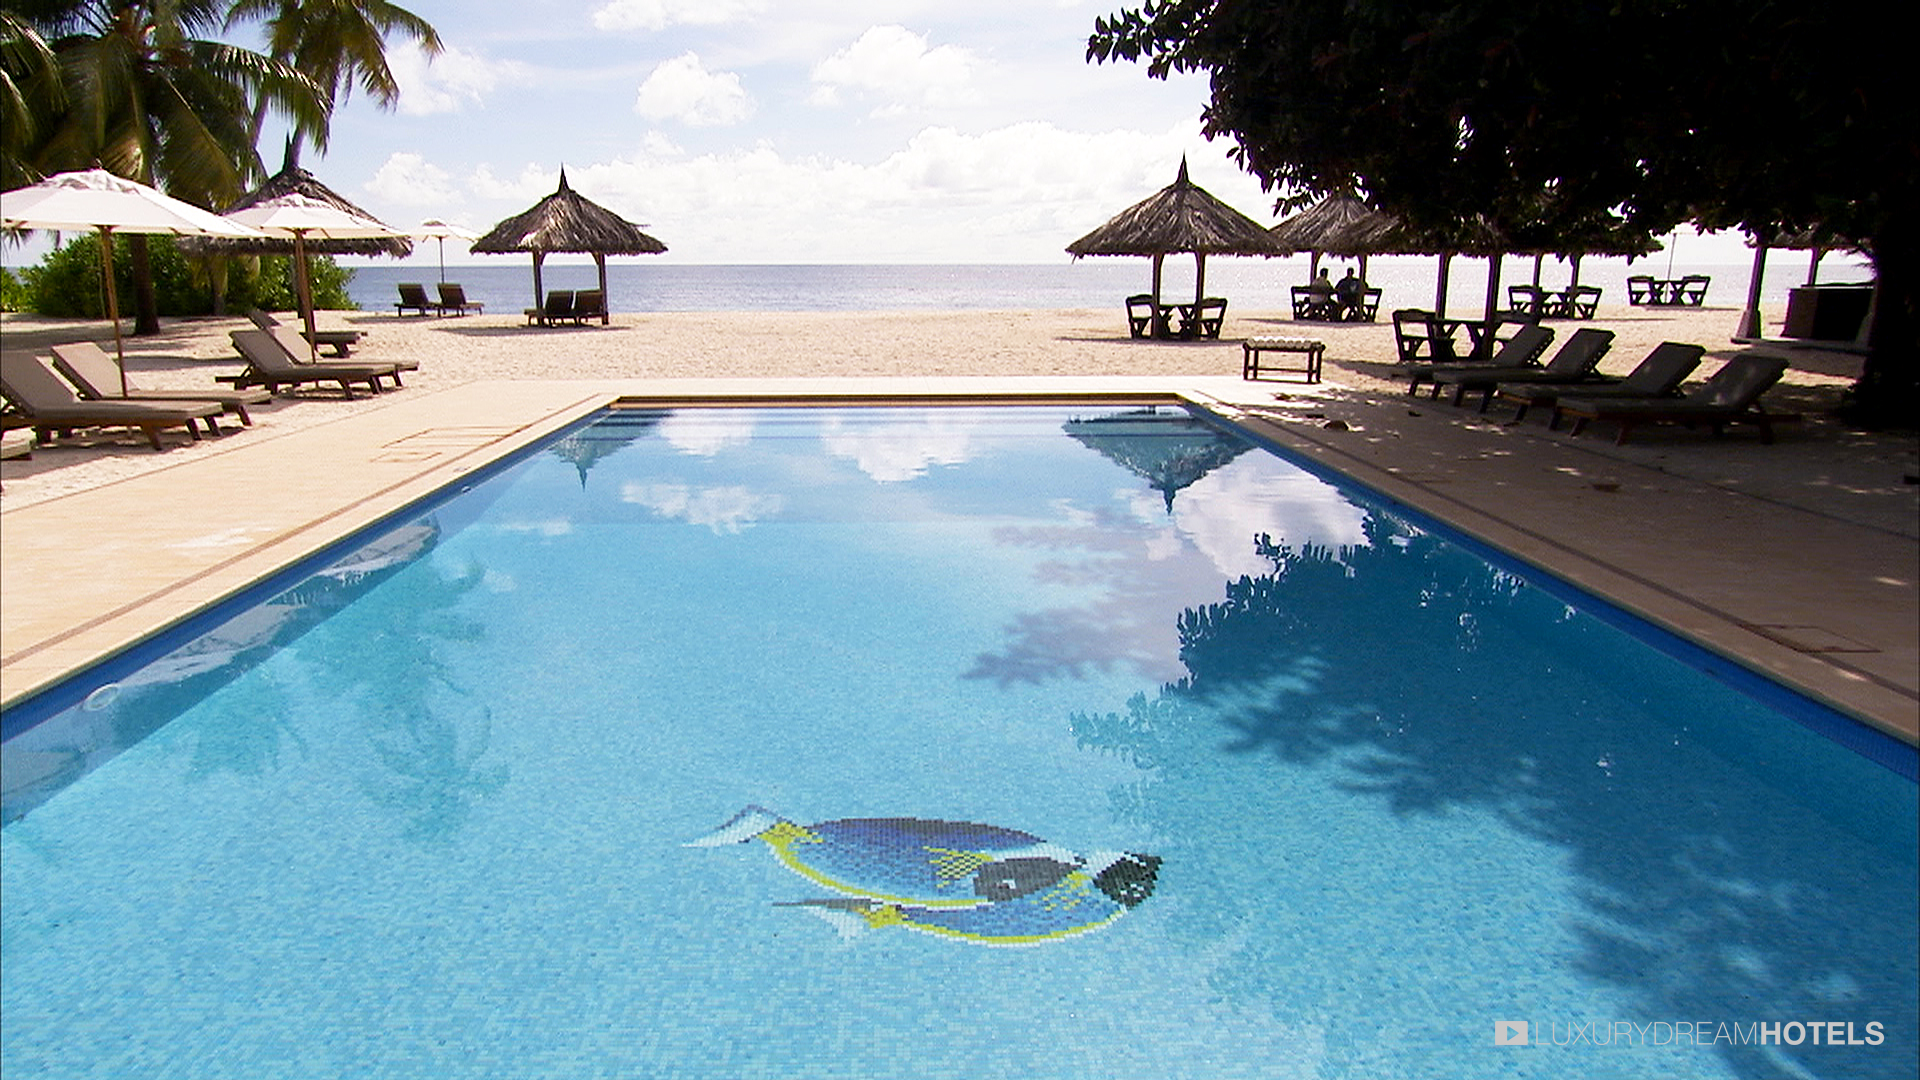 Luxury Hotel, Desroches Island Resort, Desroches Island, Seychelles    Luxury Dream Hotels